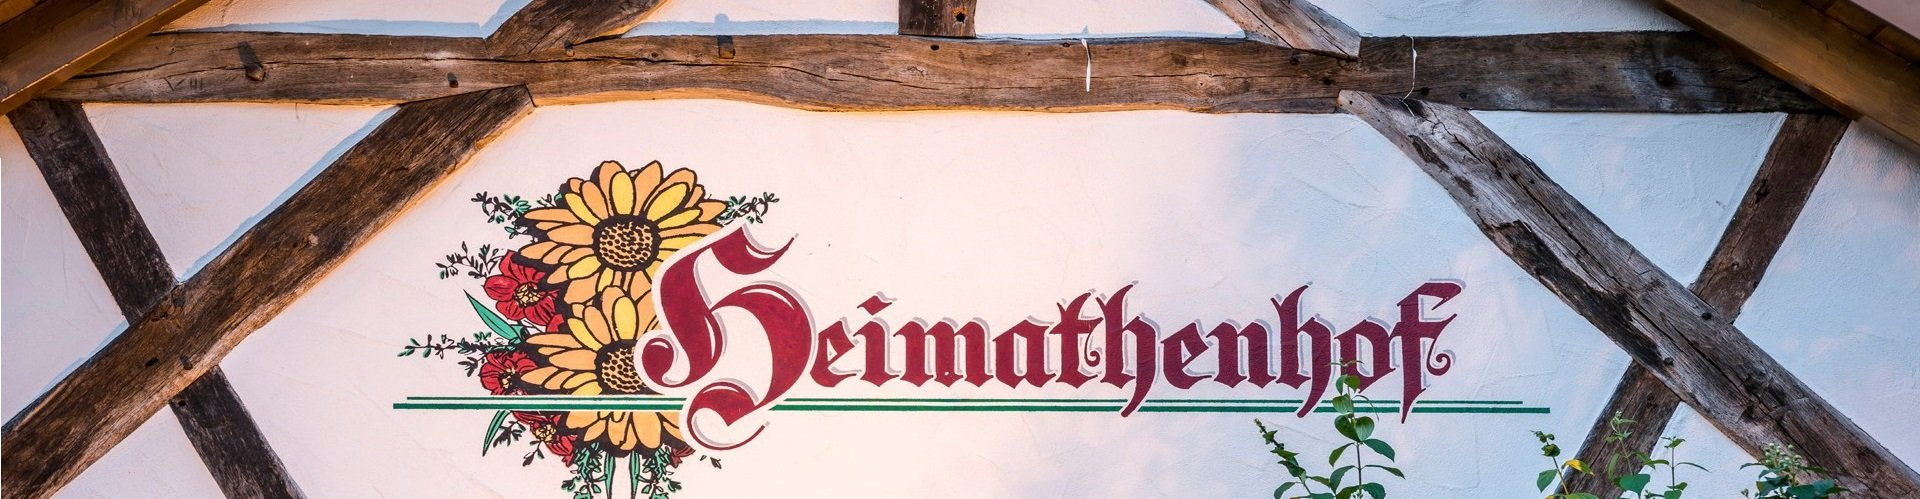 Banner 2 Hotel Heimathenhof